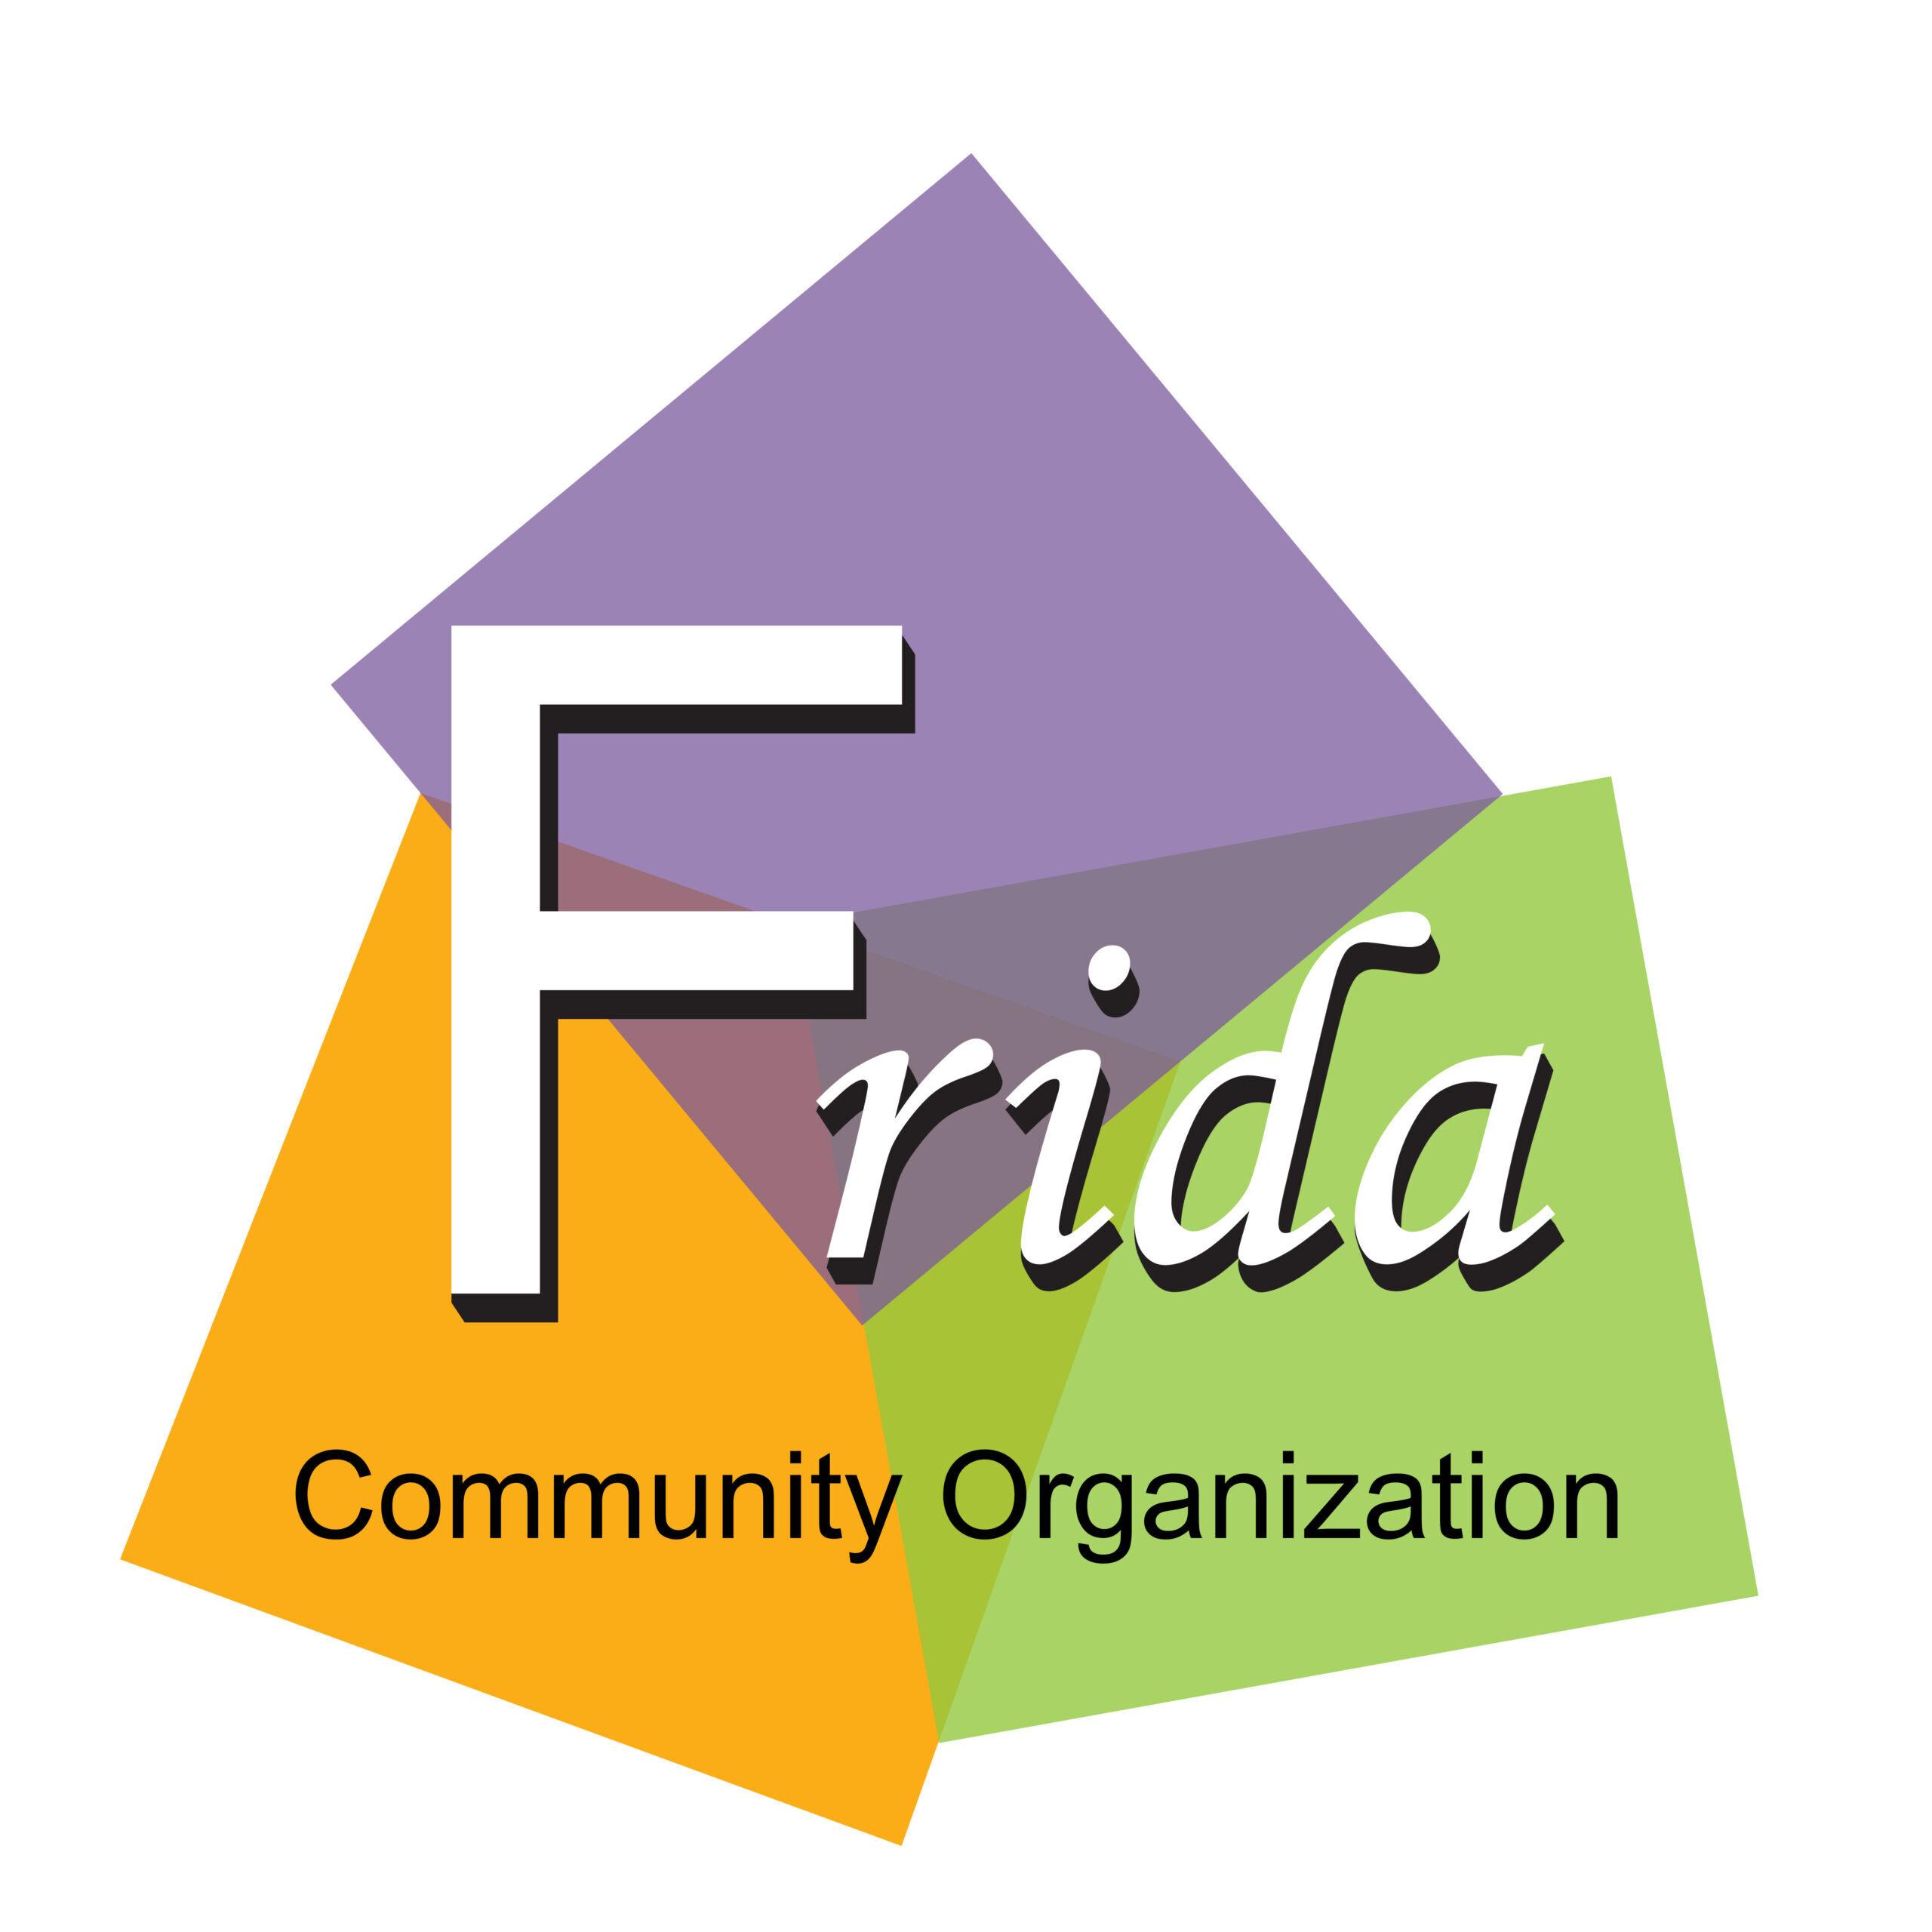 Frida Community Organization